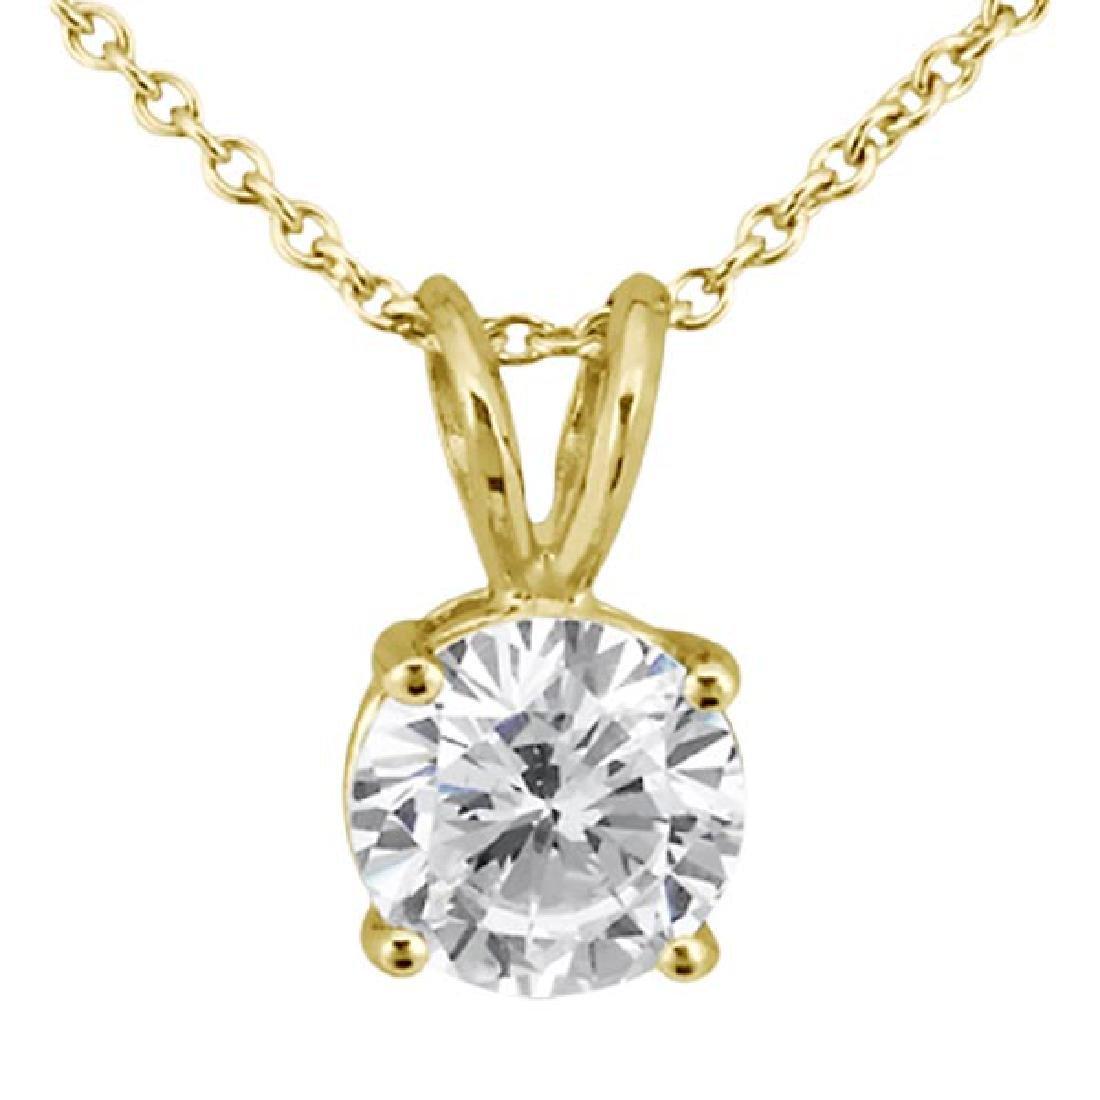 1.00ct. Round Diamond Solitaire Pendant in 18k Yellow G